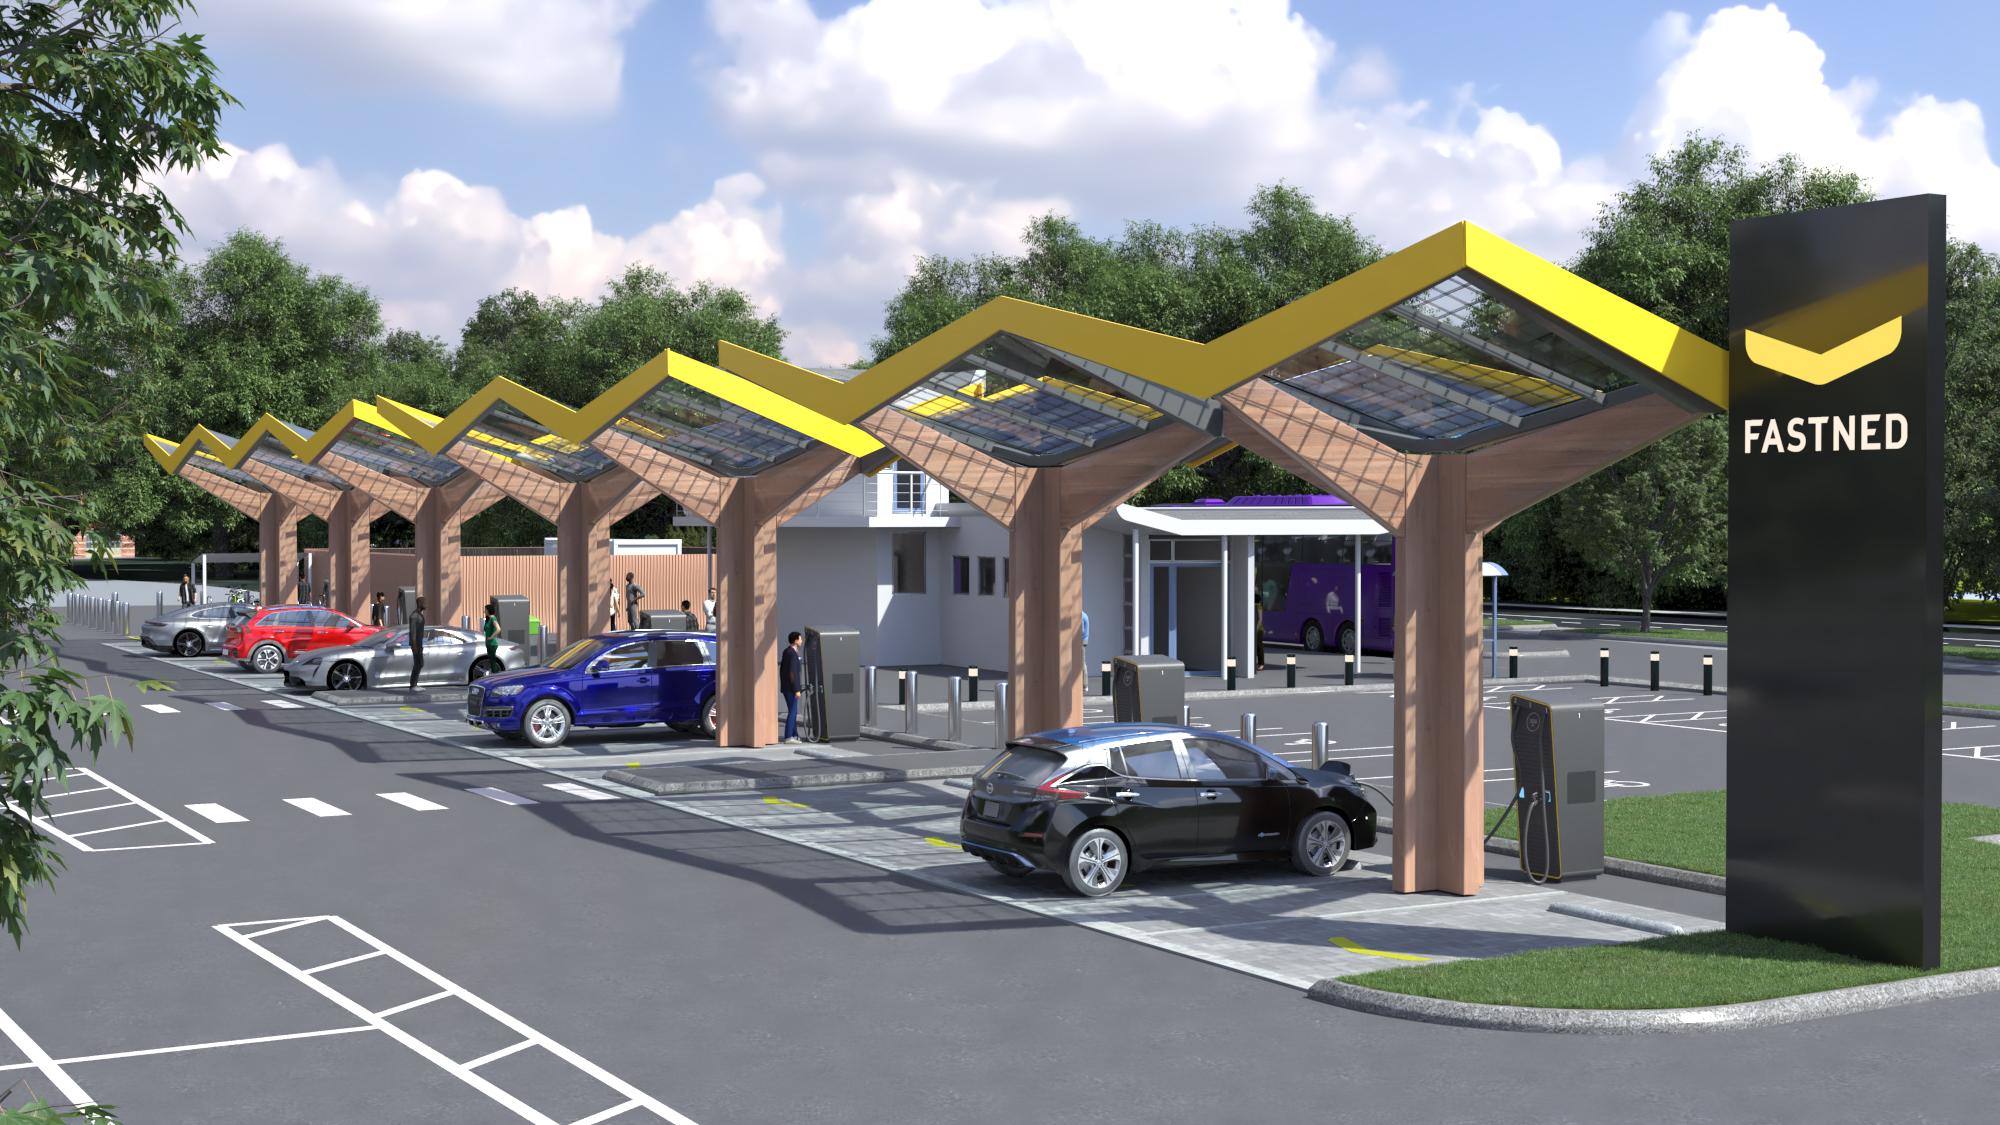 Tesla and Fastned create 'Energy Superhub' charging station